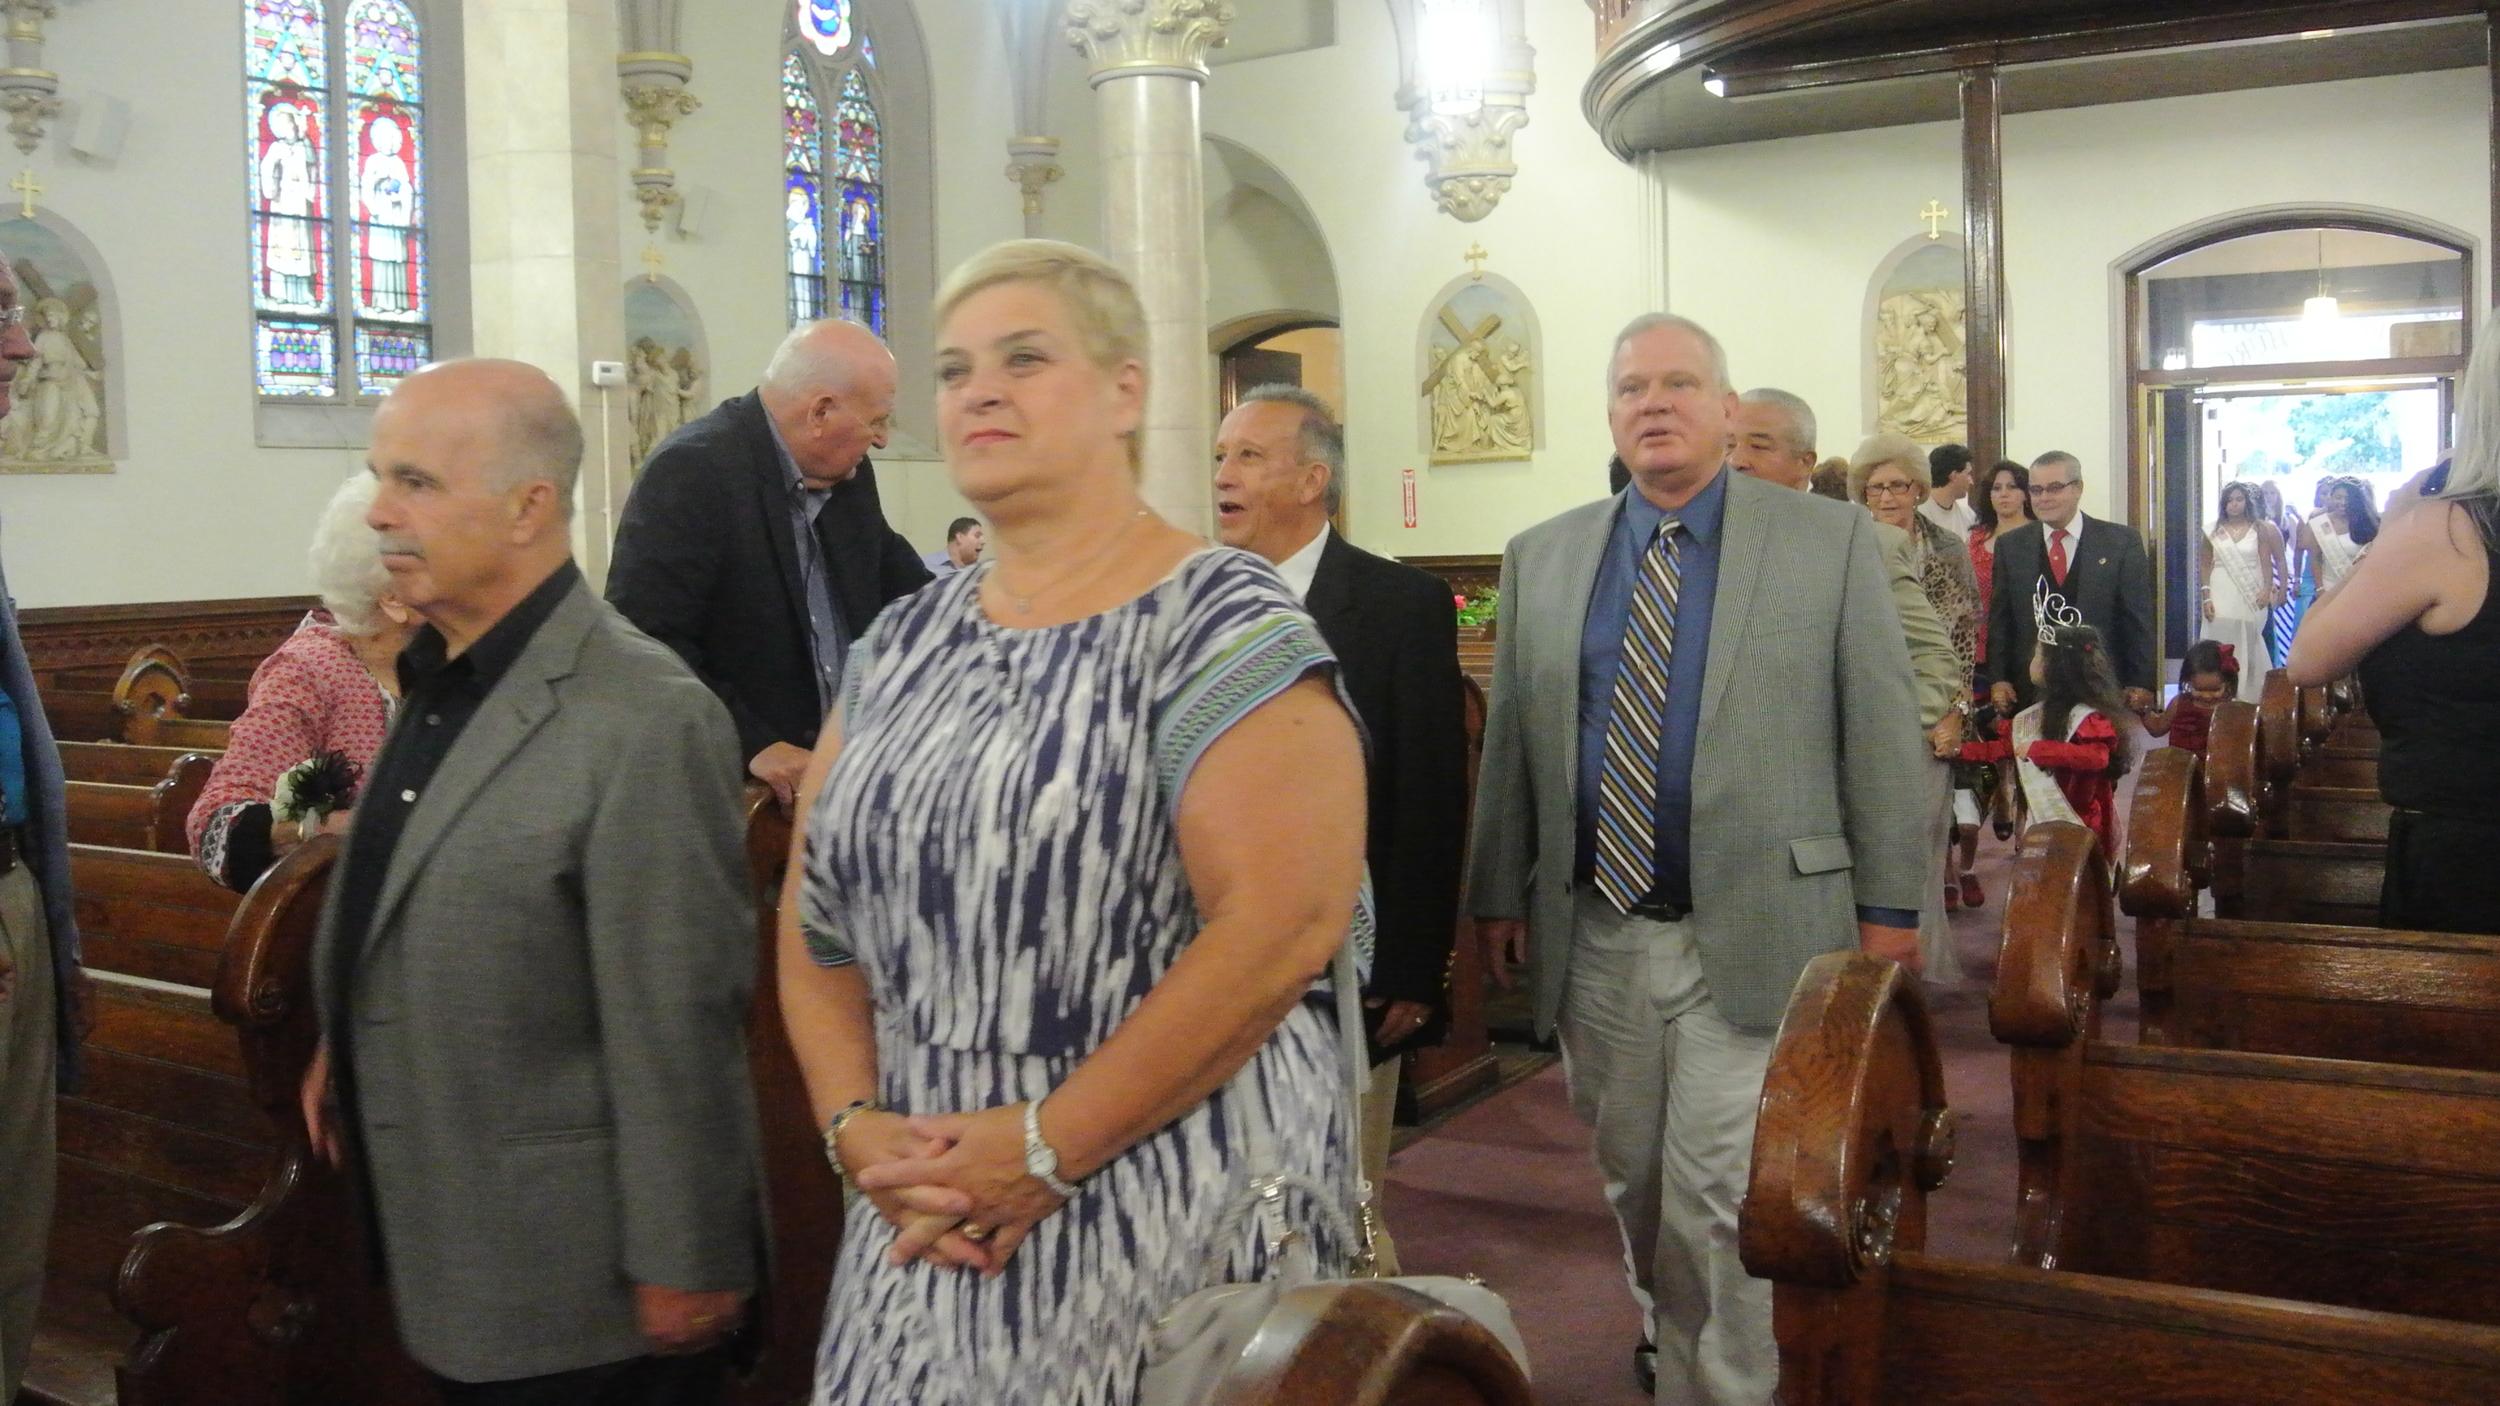 Councilman Laurence Bennett and Councilwoman Carol Mandaglio